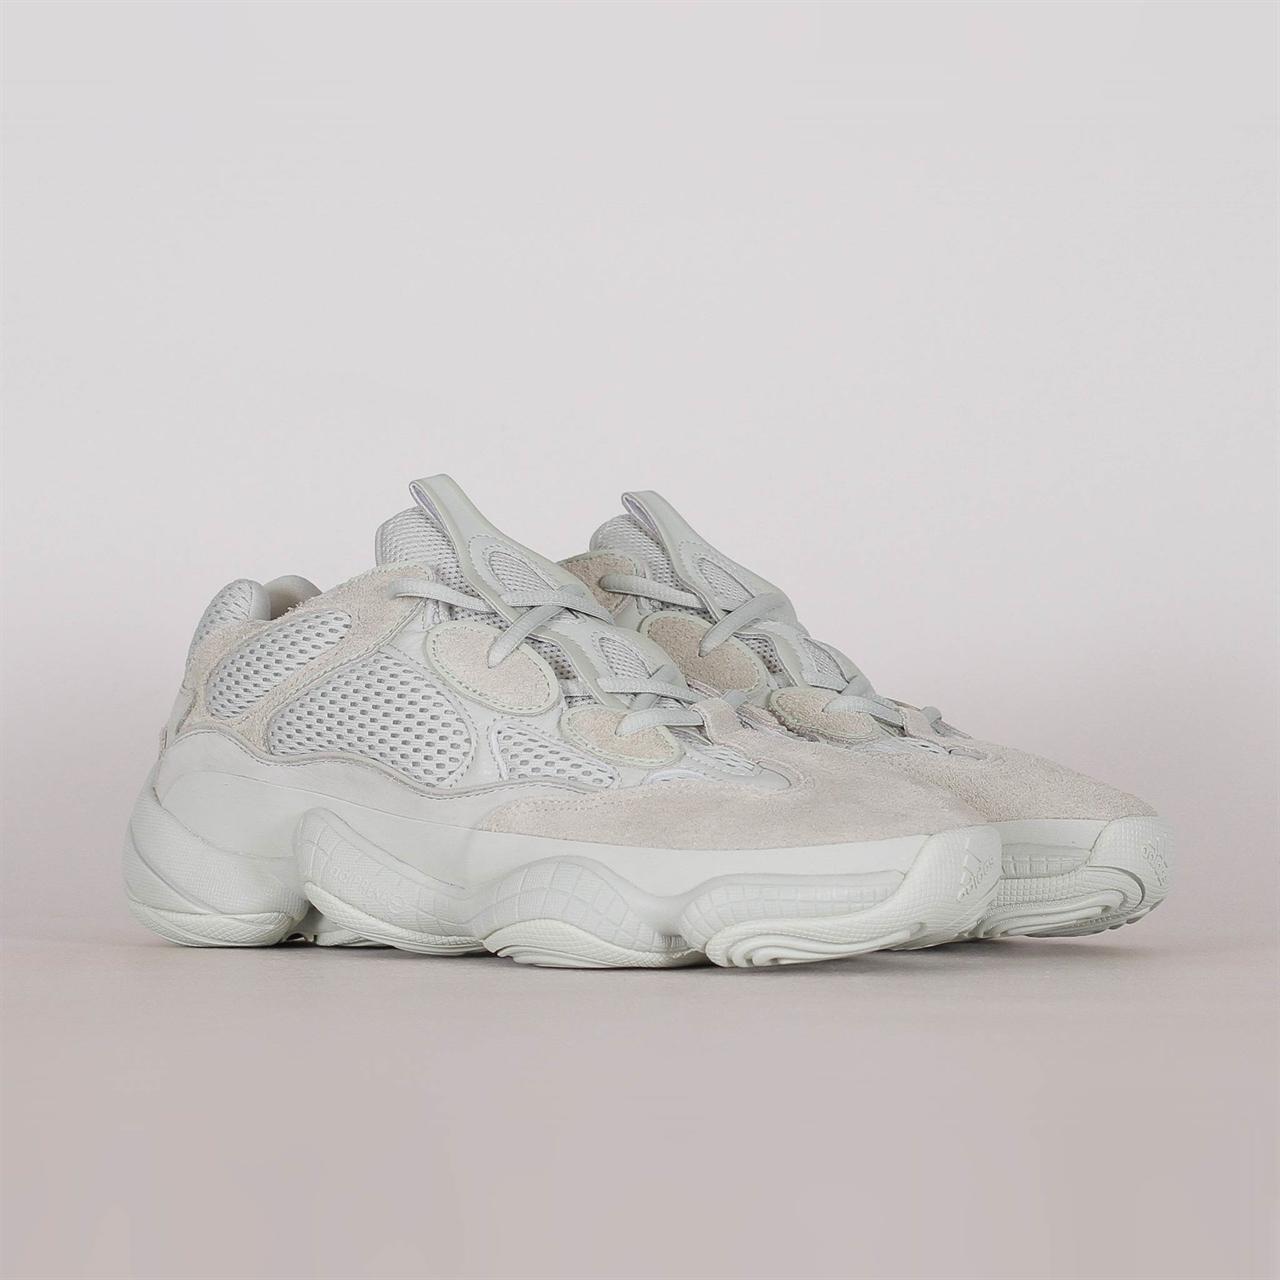 41f15fd983f Shelta - Adidas Originals Yeezy 500 Salt (EE7287)